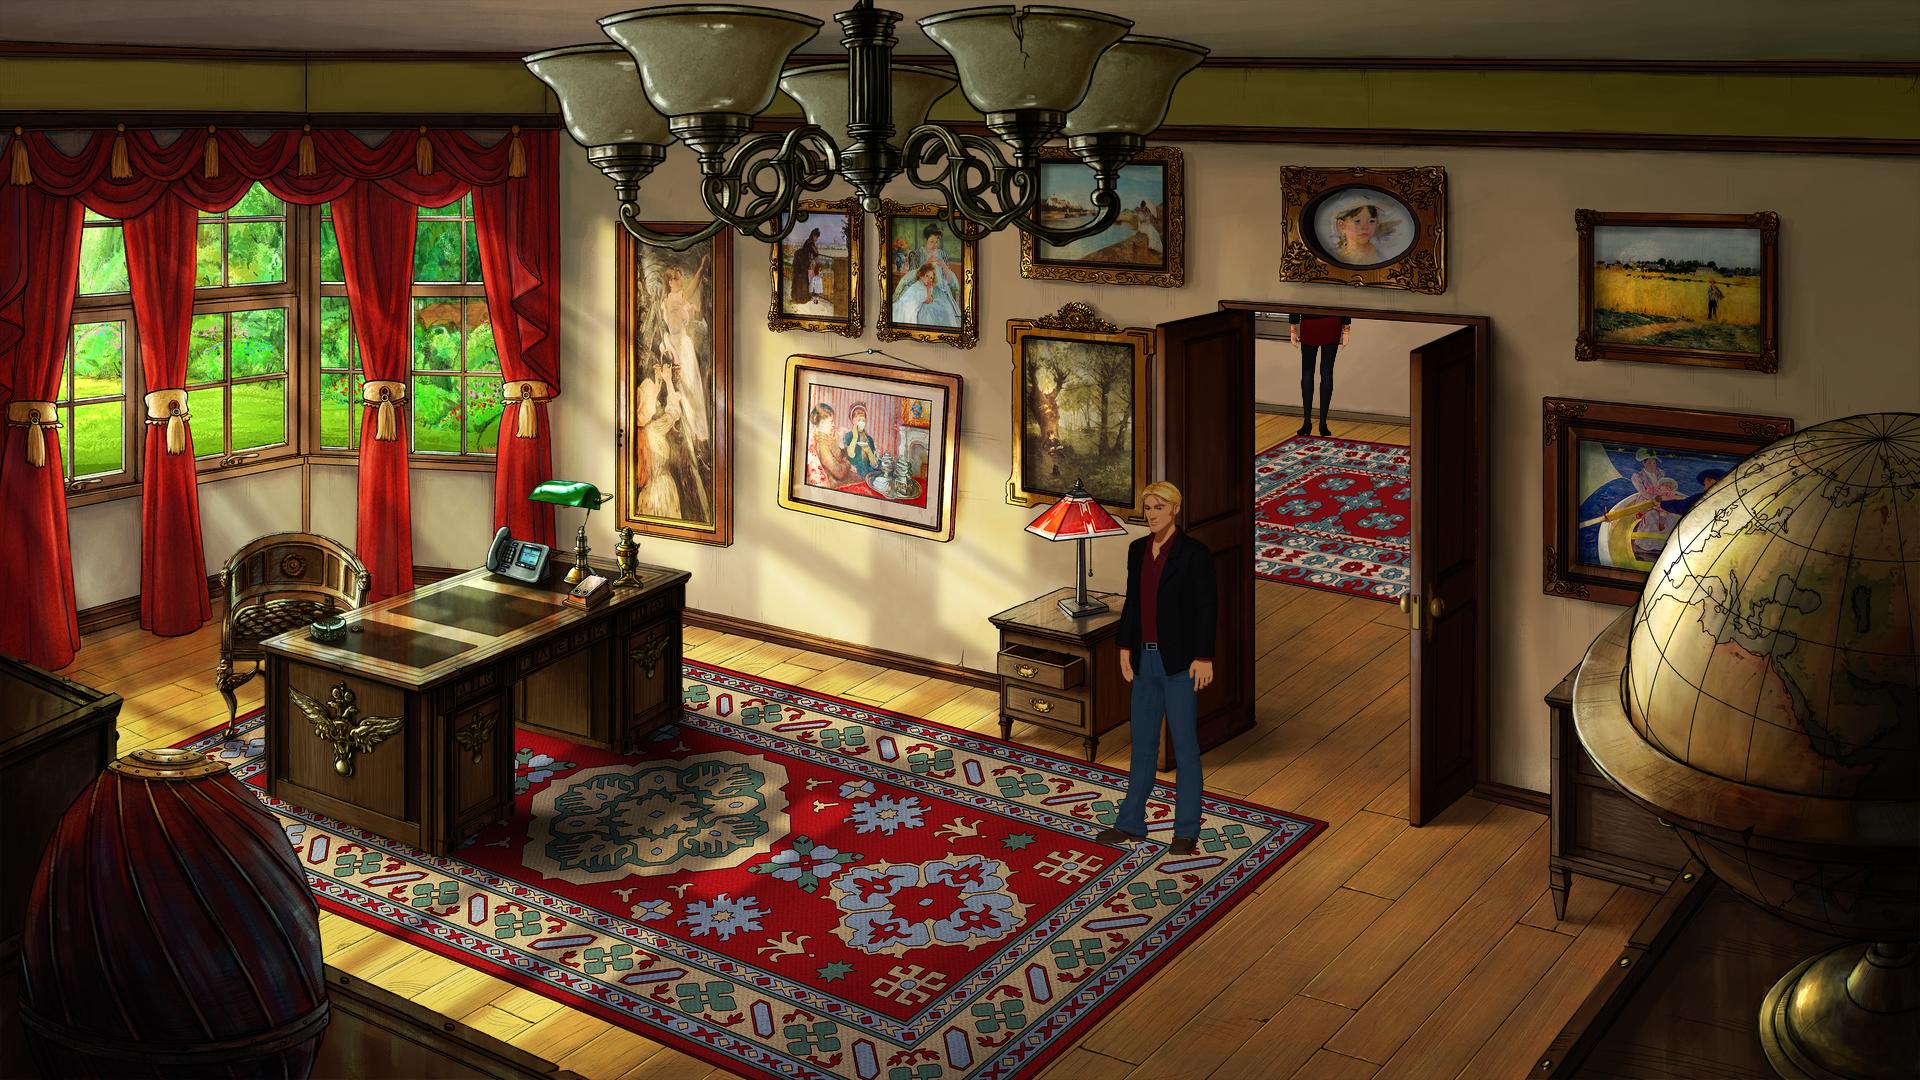 HQ Broken Sword 5: The Serpent's Curse Wallpapers   File 4474.03Kb